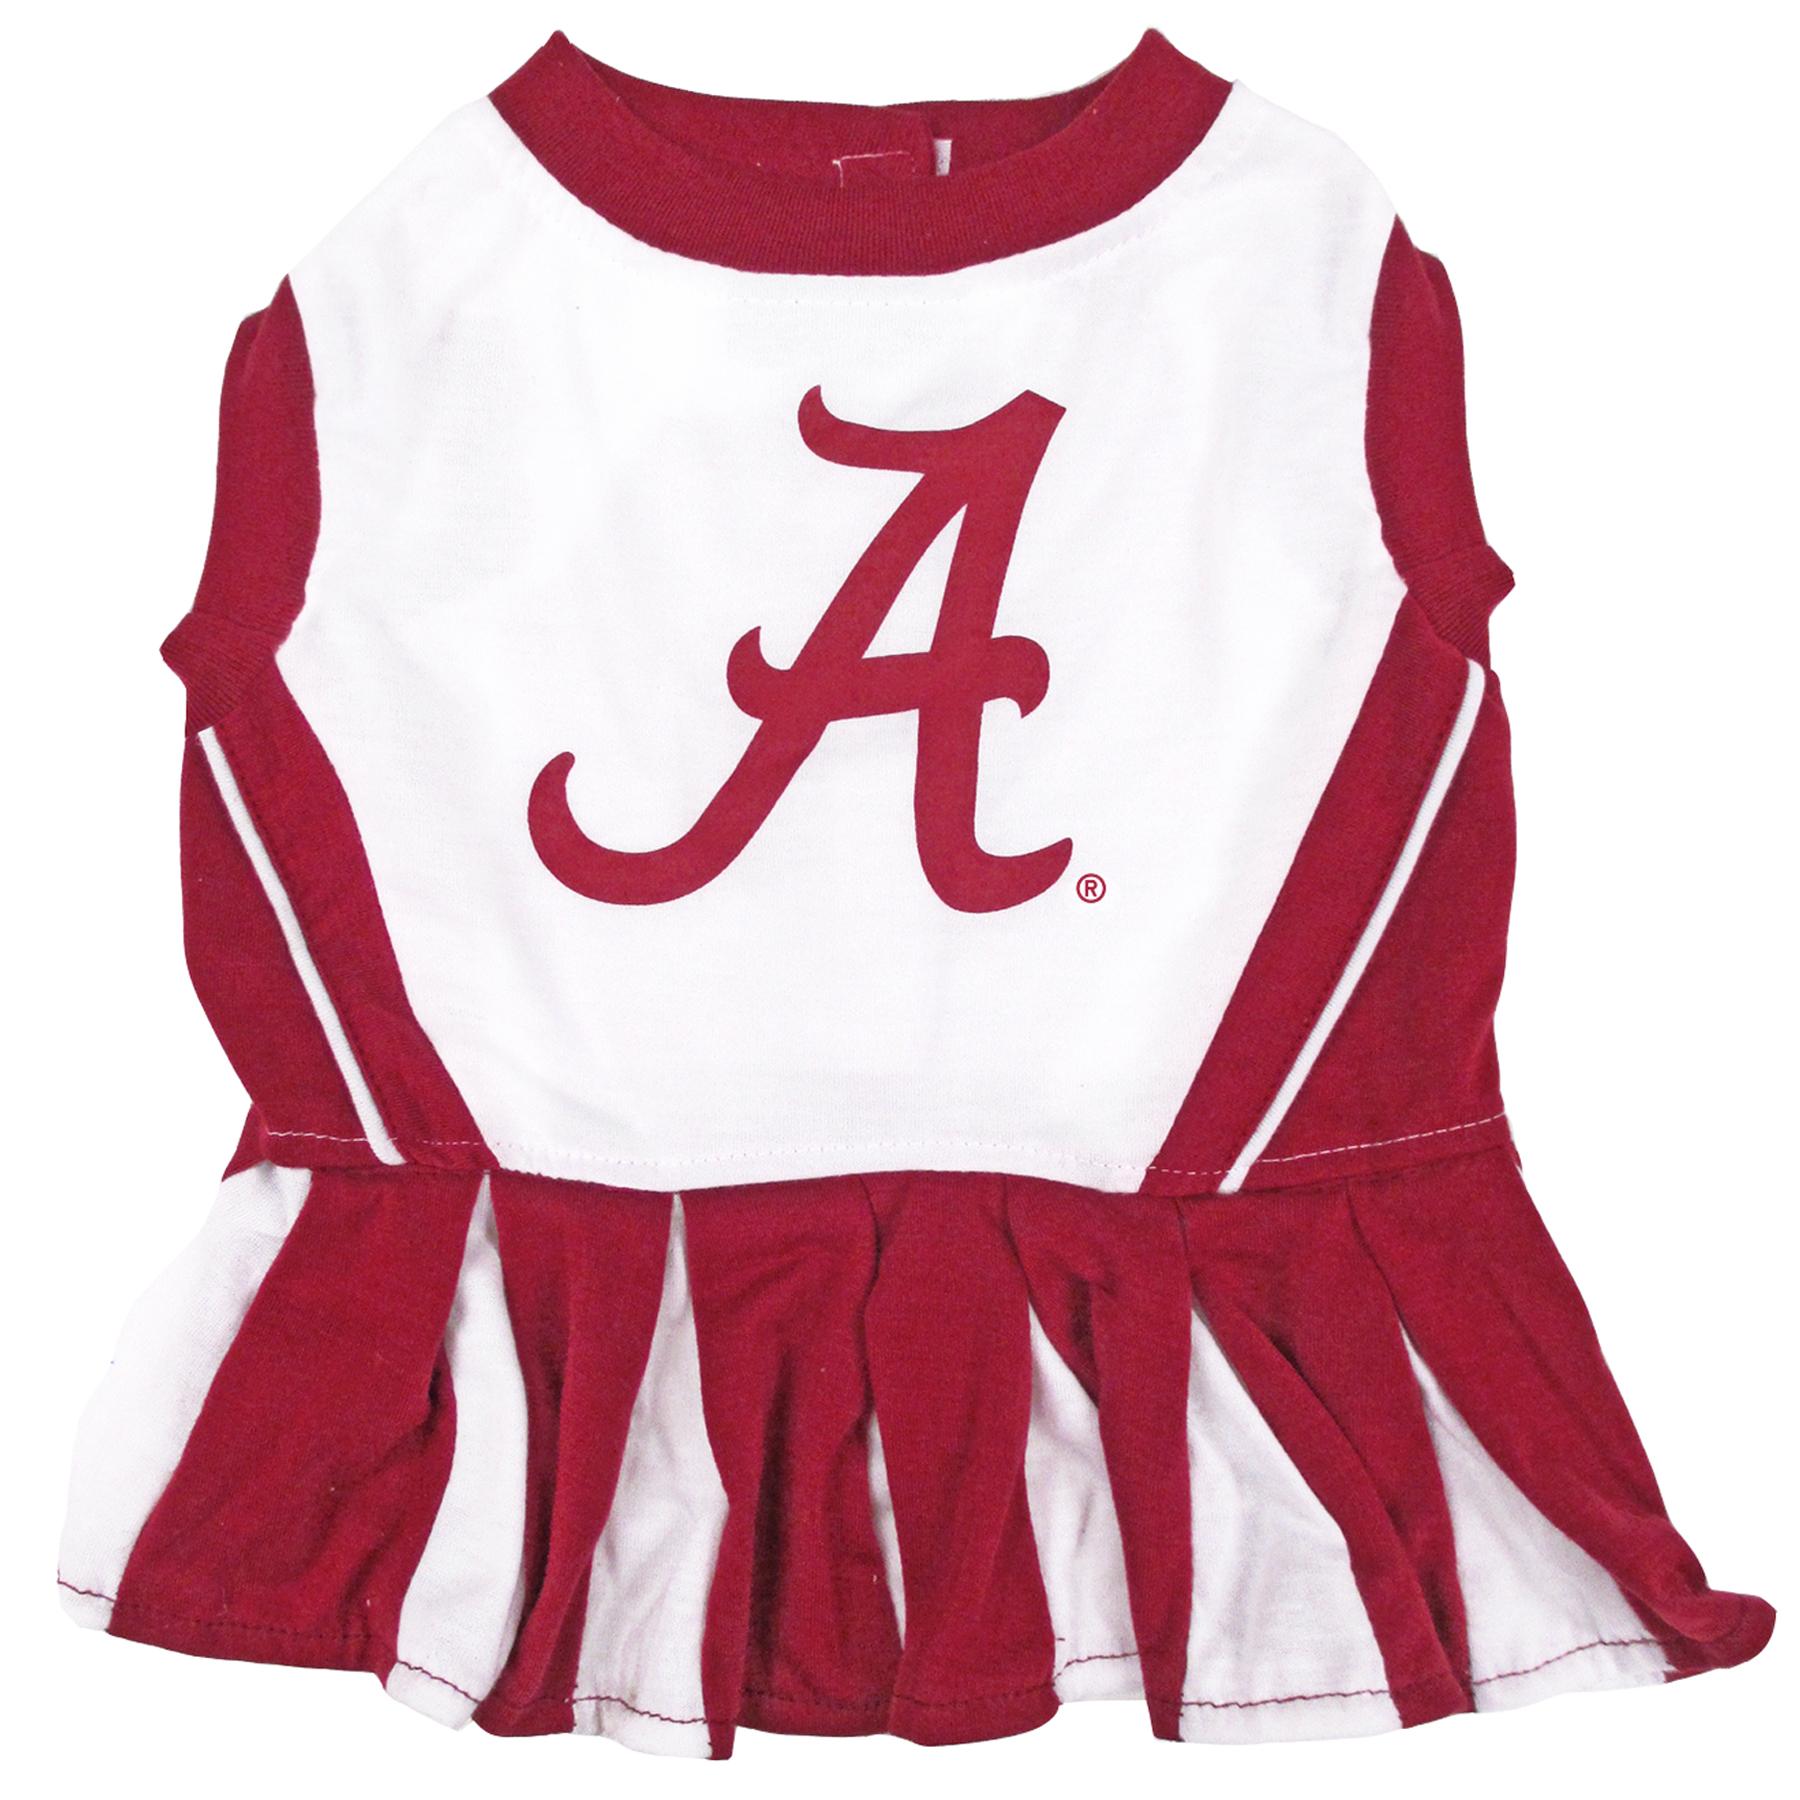 Collegiate Alabama Crimson Tide Cheerleader - Extra Small